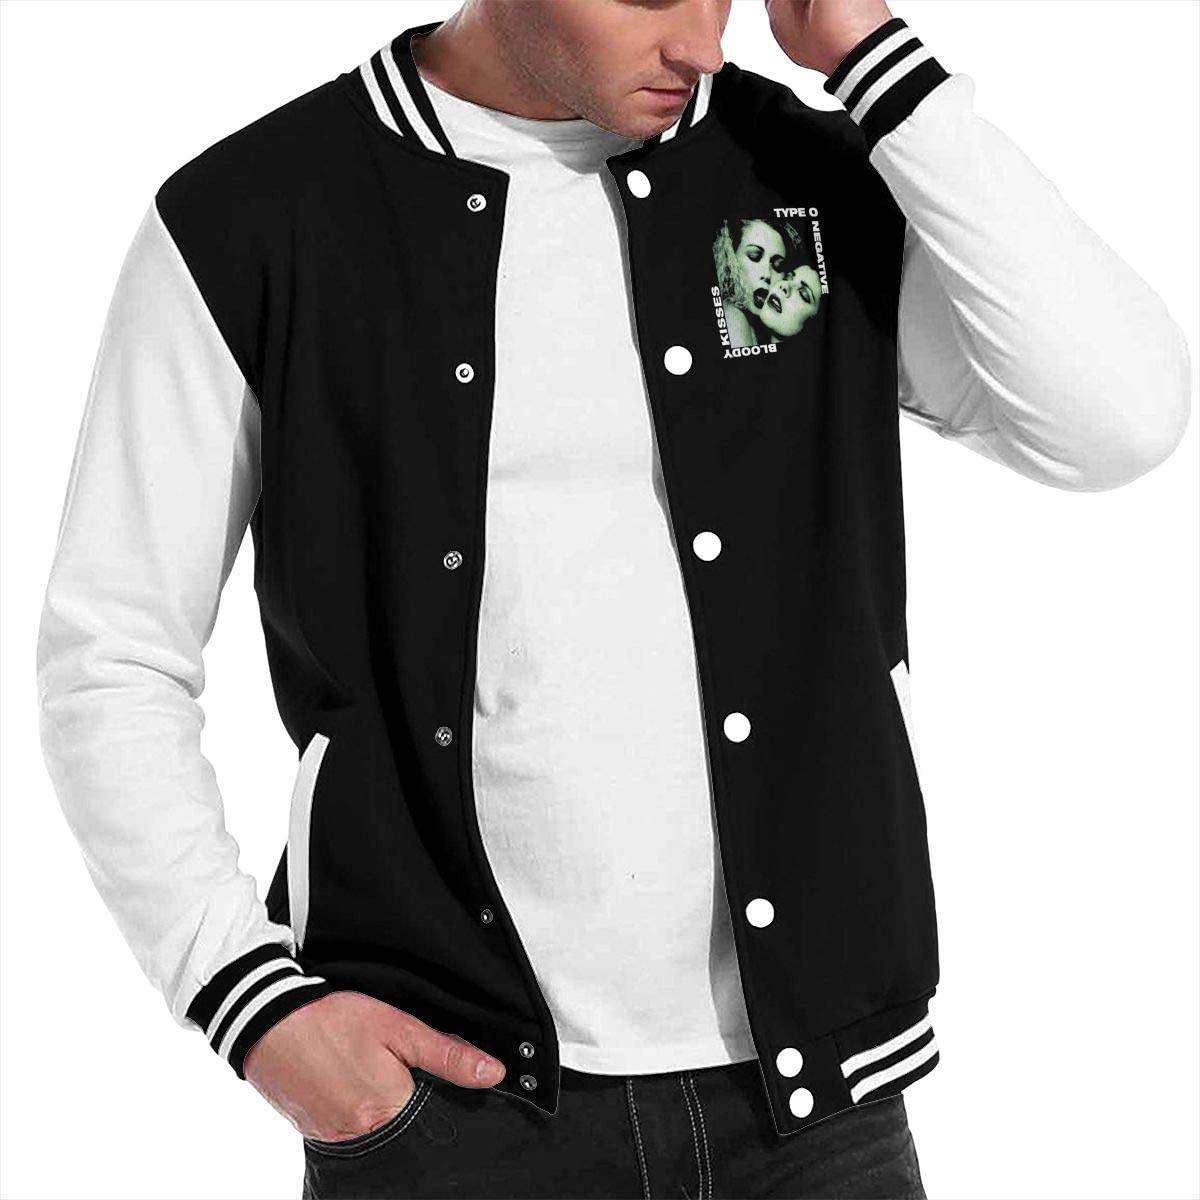 Type O Negative Unisex Hipster Baseball Uniform Jacket Sport Coat Black Black